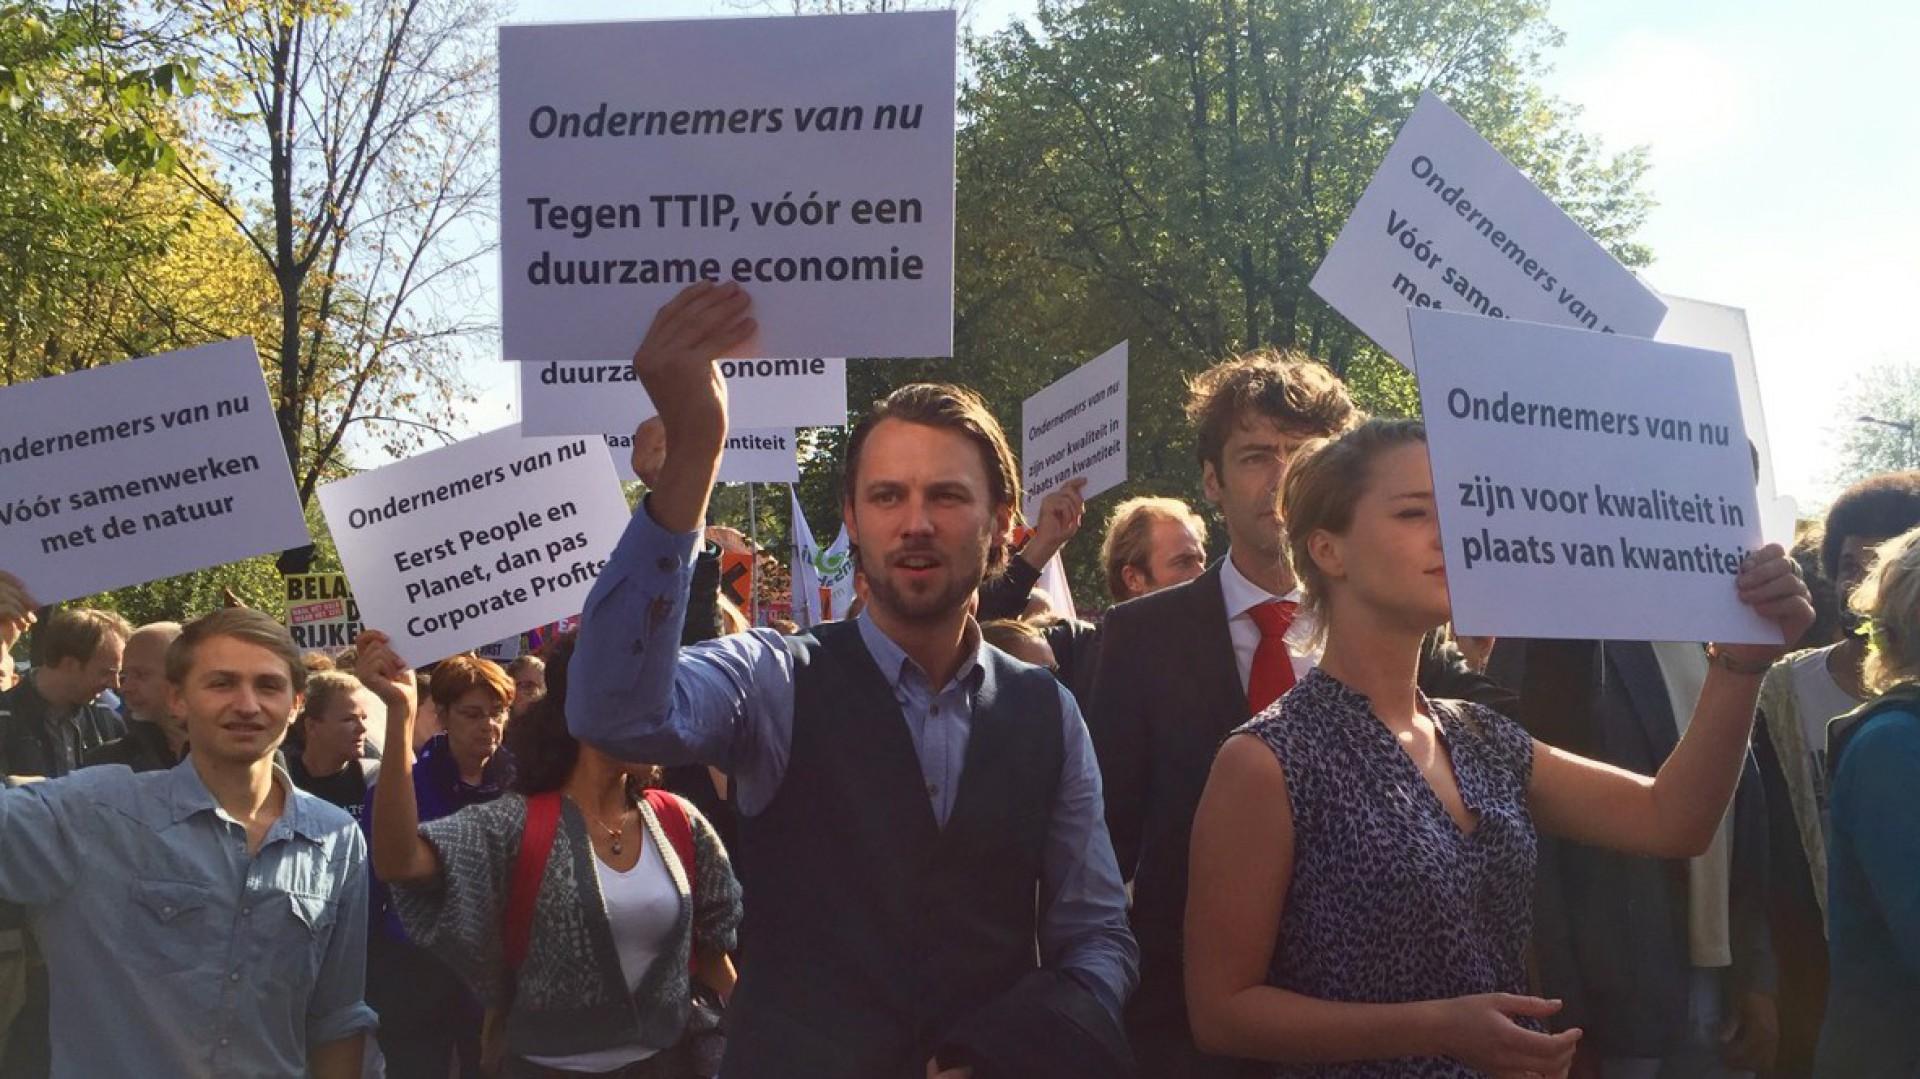 Tegen TTIP, vóór een duurzame economie